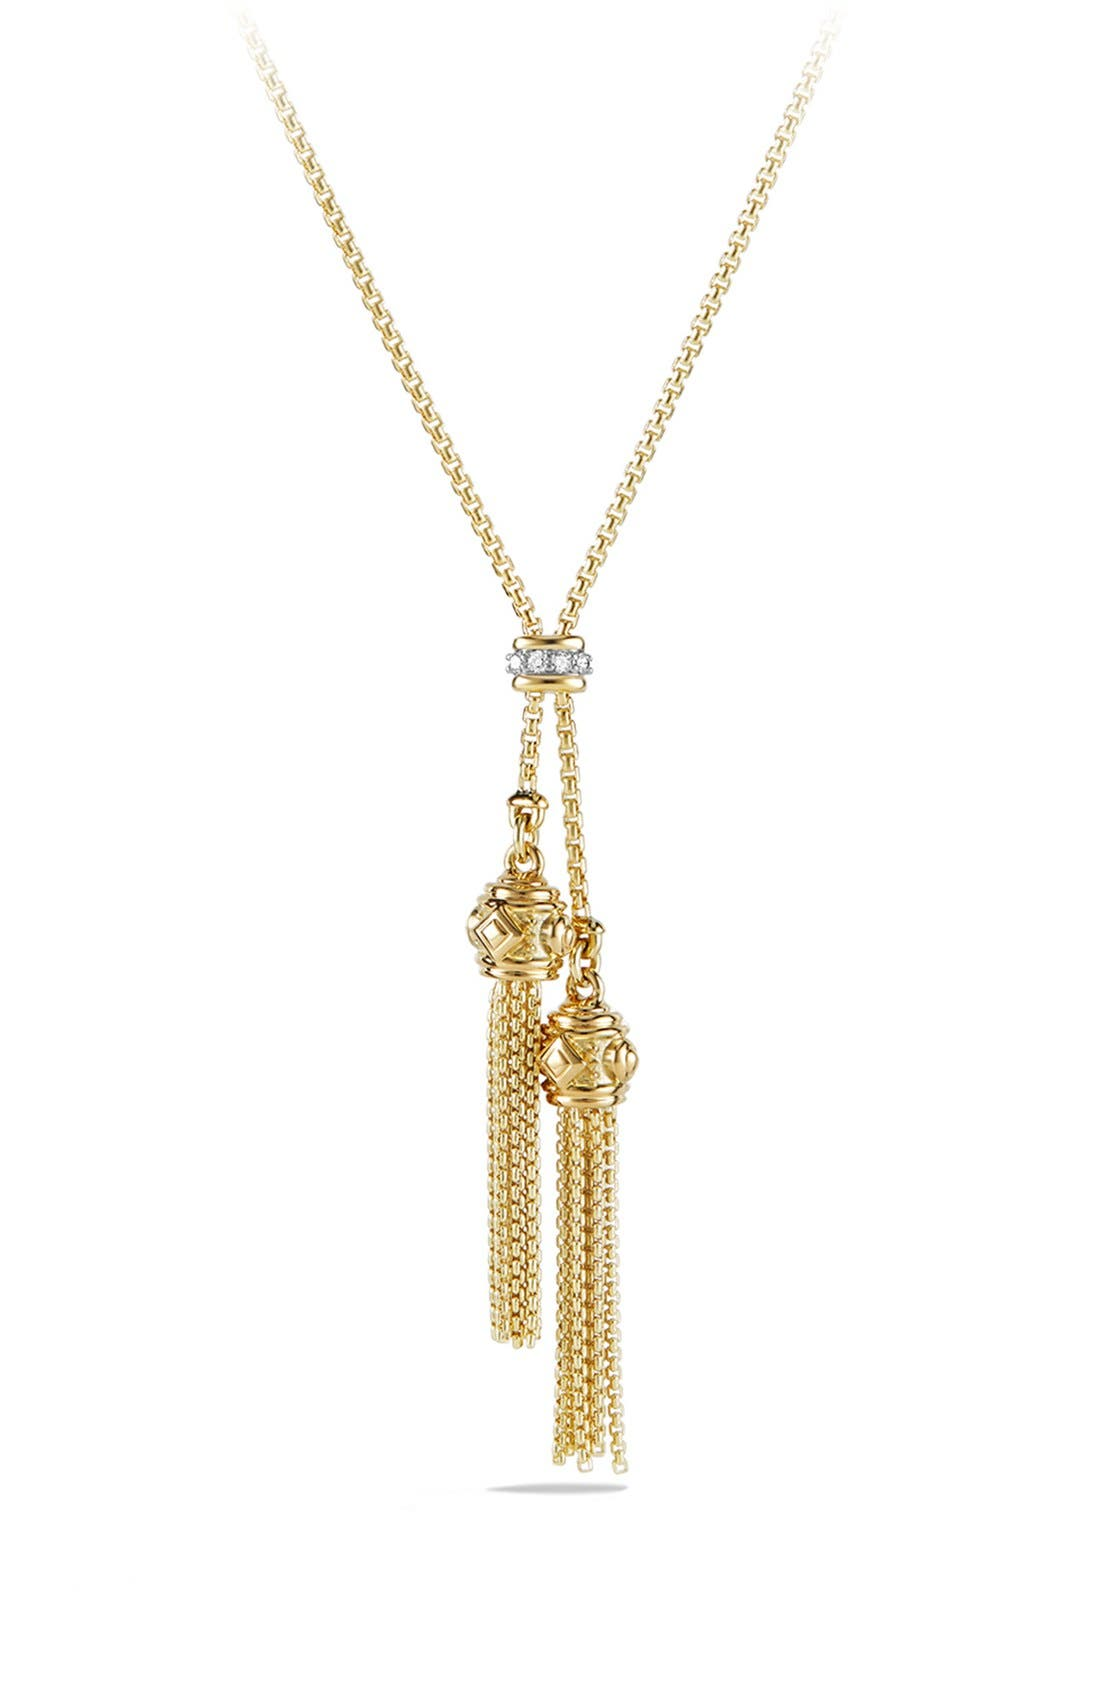 David Yurman 'Renaissance' Tassel Necklace with 18K Gold and Diamonds